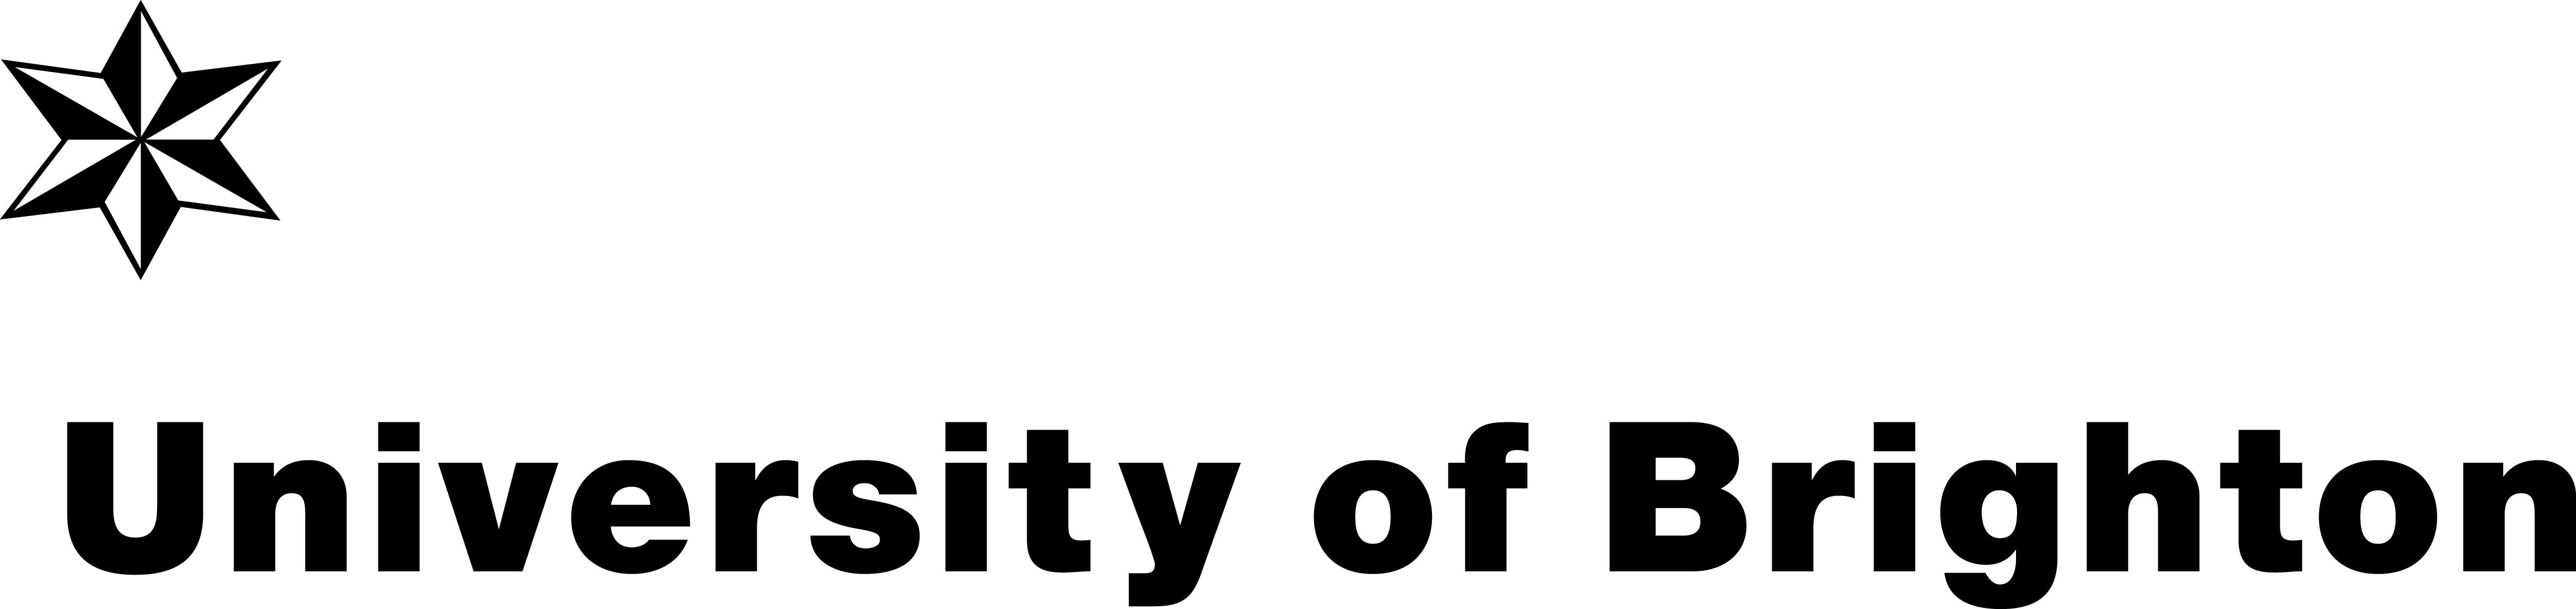 University of Brighton img-responsive